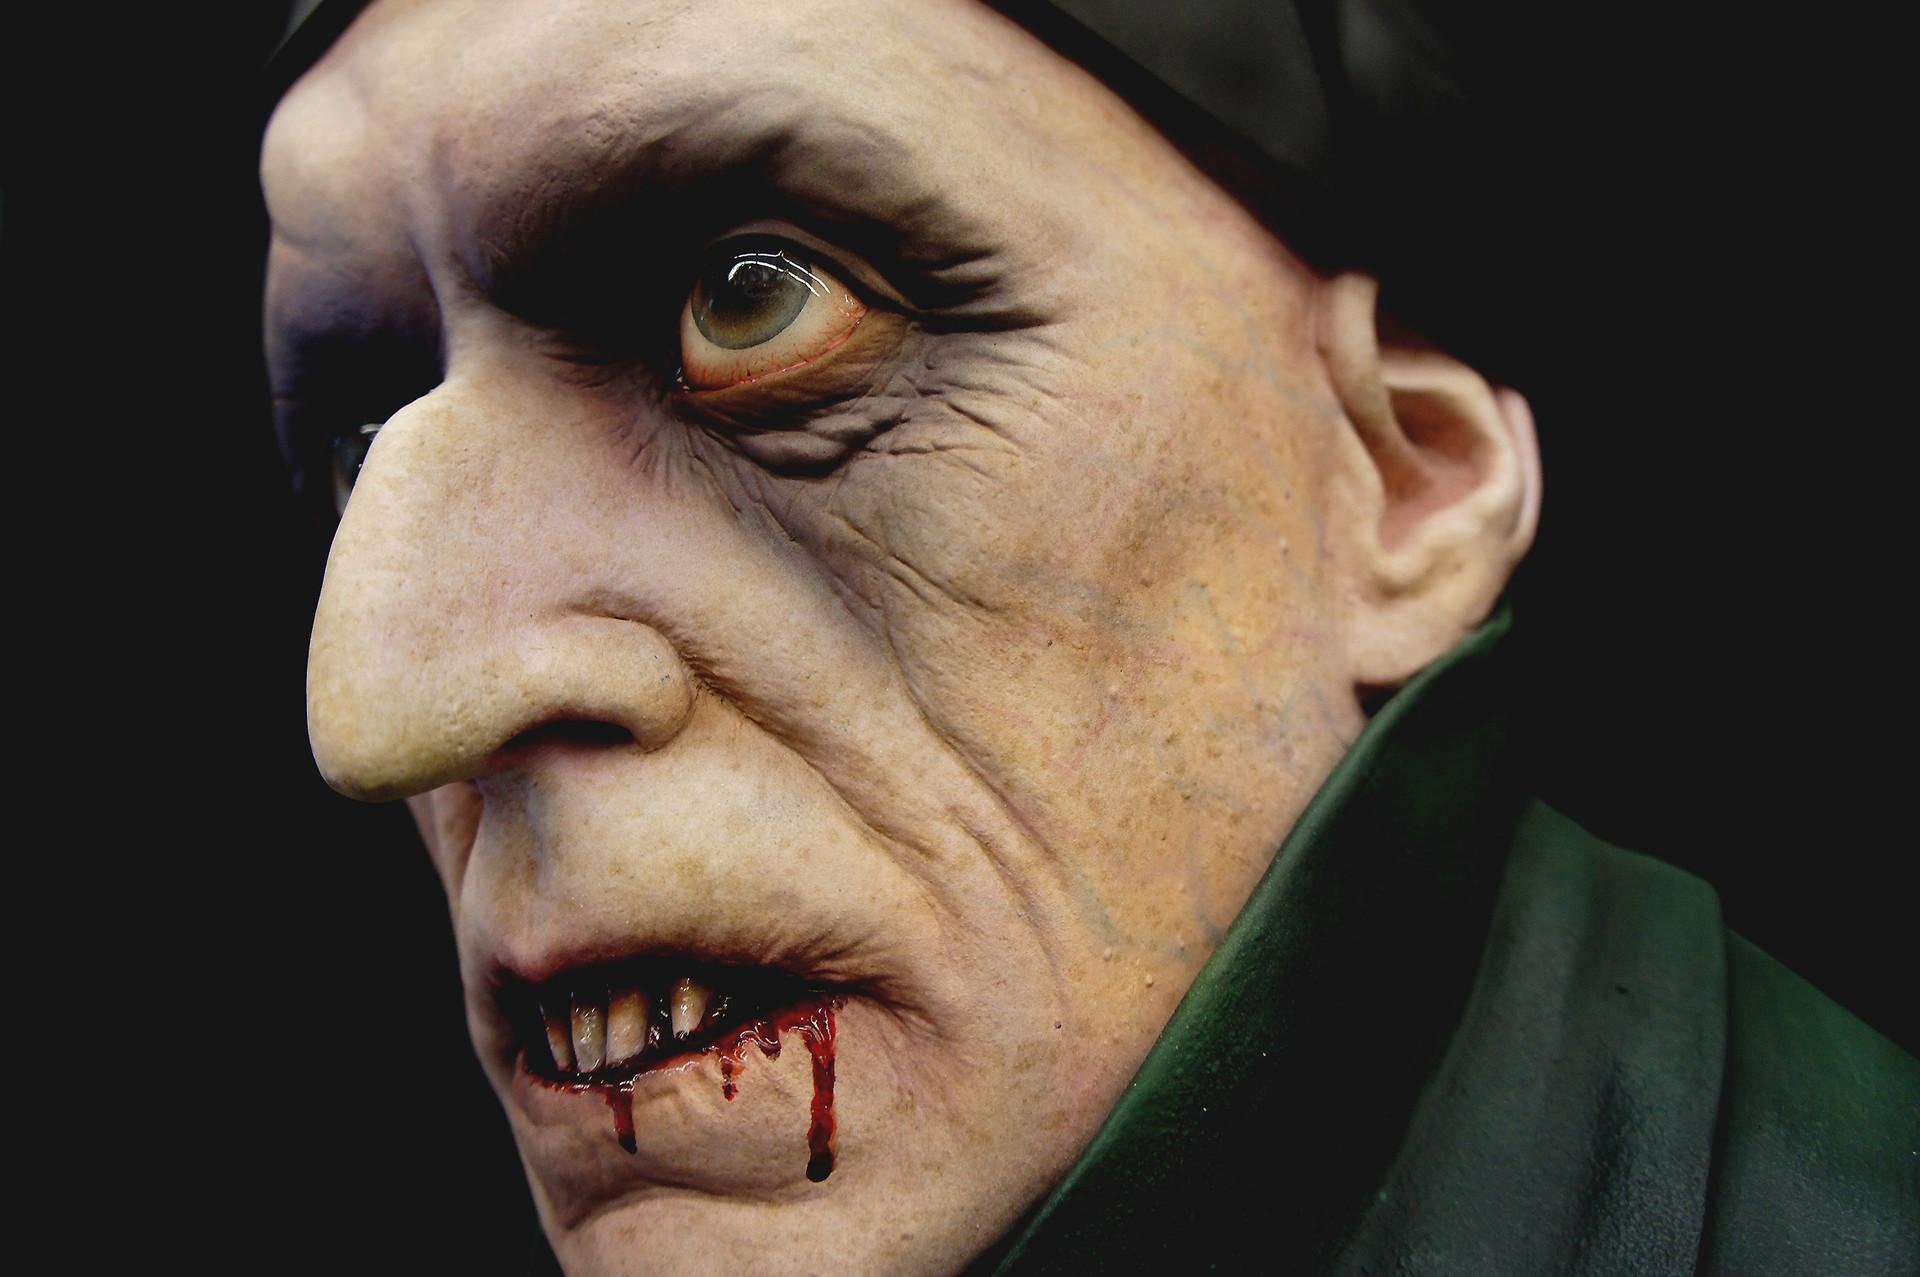 Nosferatu Life-Size Bust 2.0